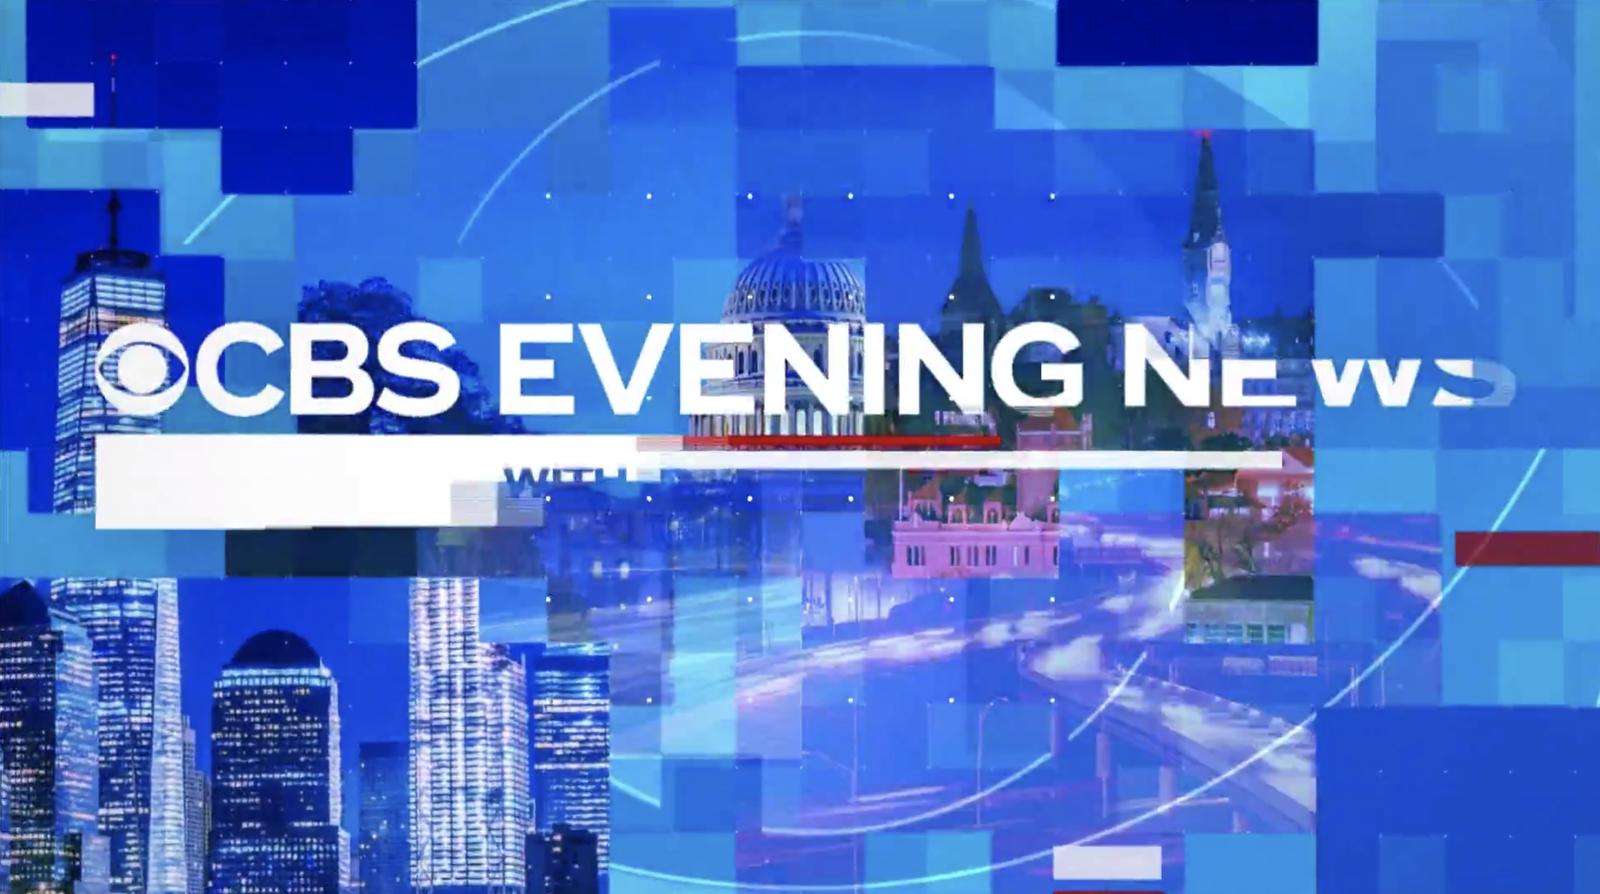 NCS_CBS-Evening-News_Motion-Design_Washington_008